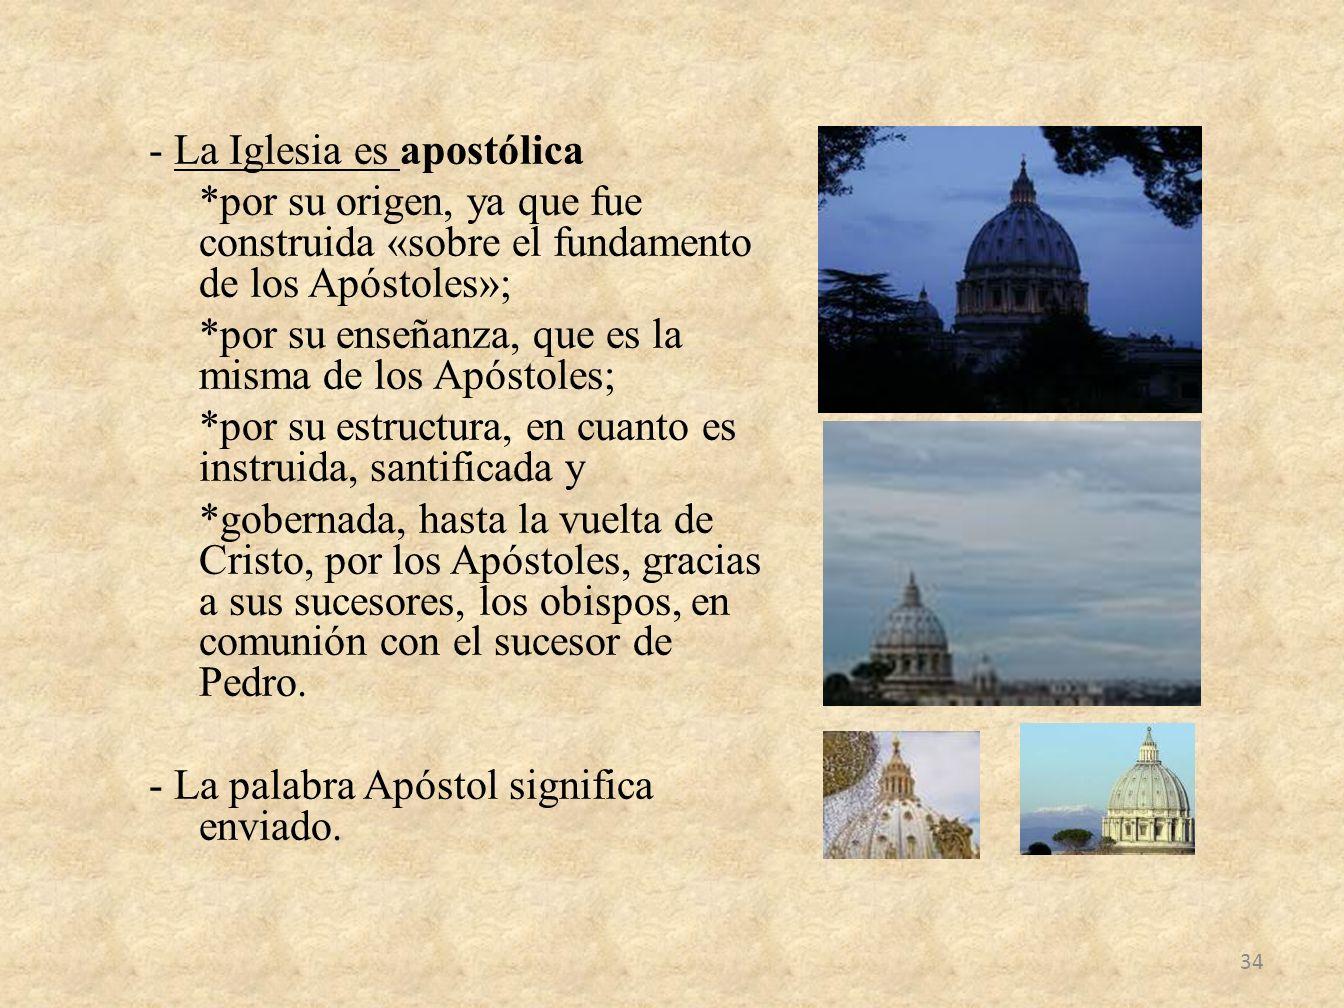 - La Iglesia es apostólica